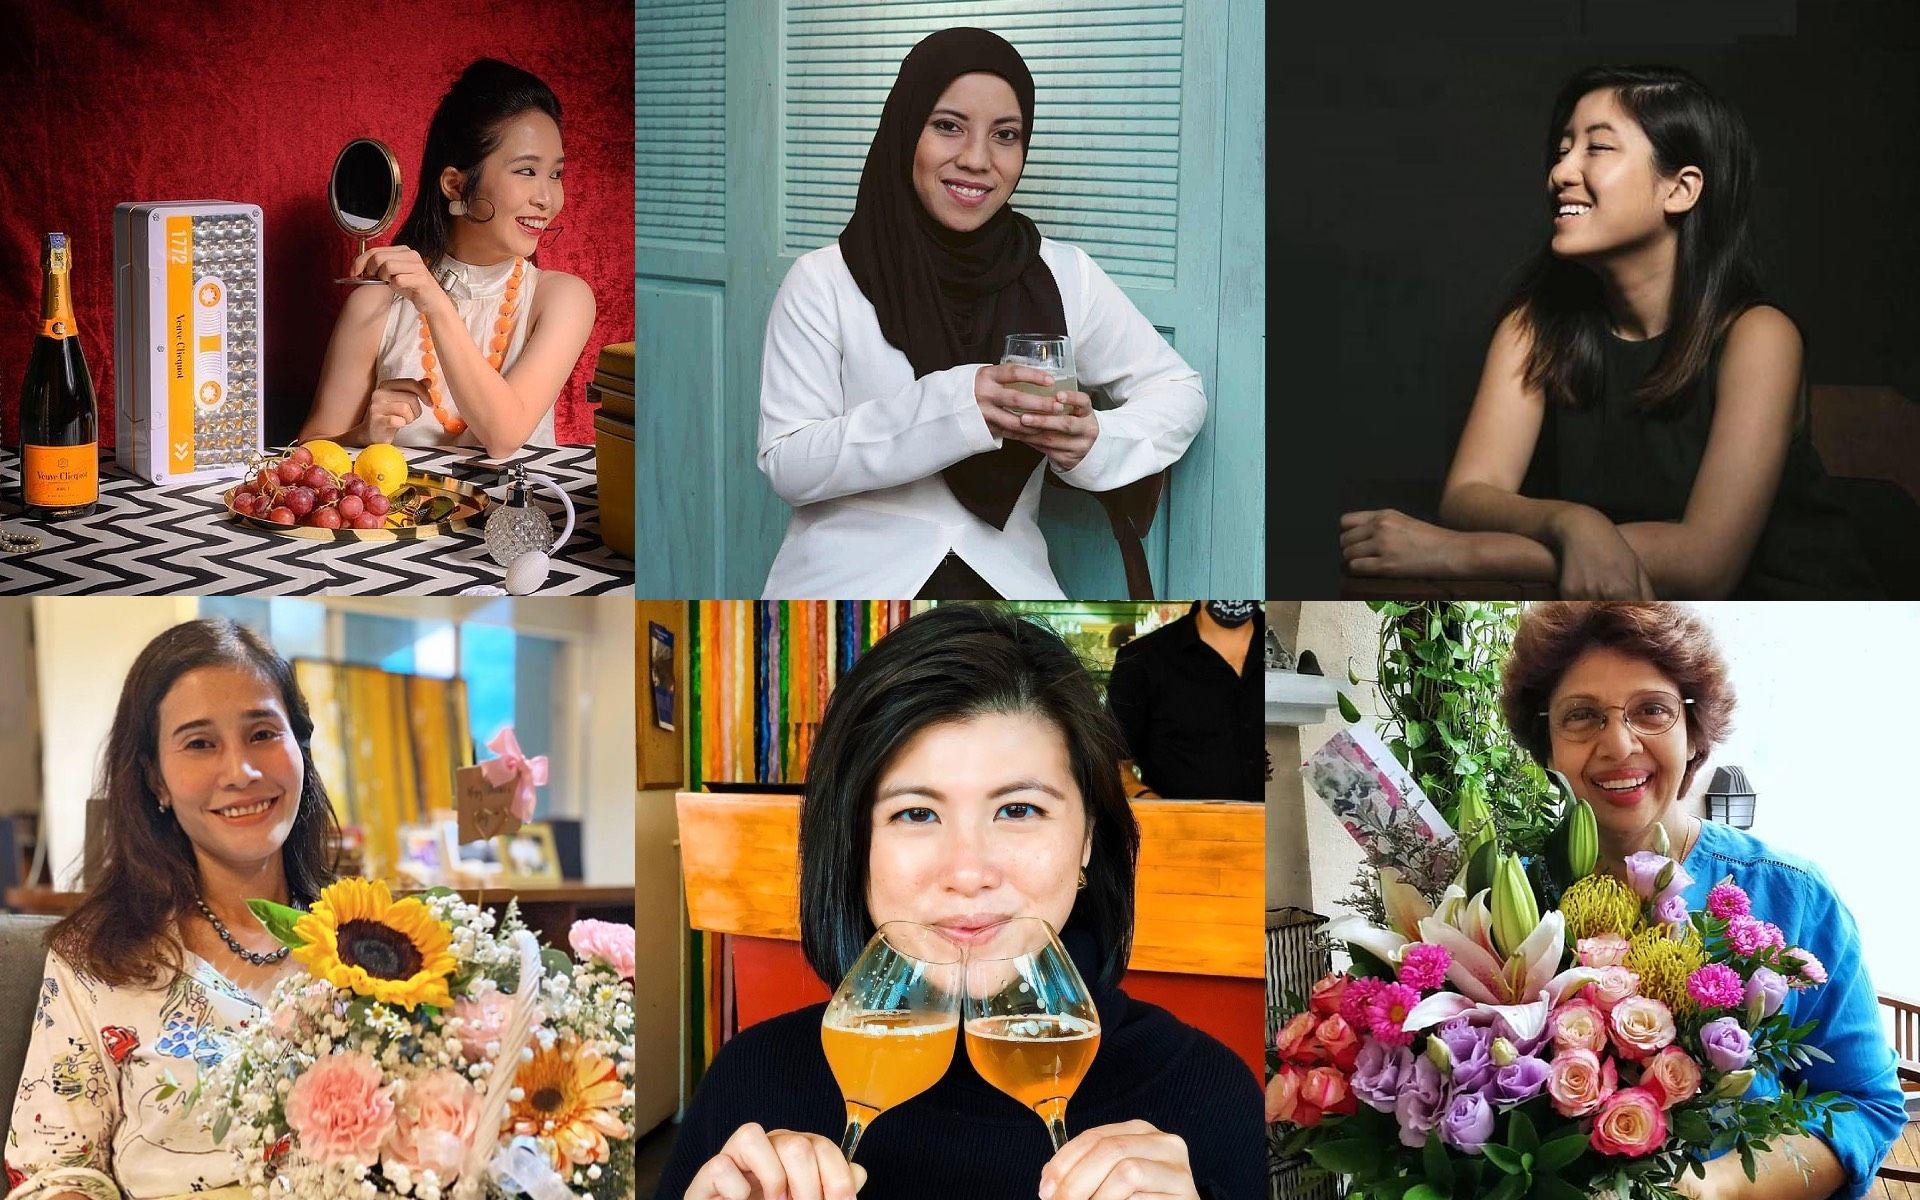 Clockwise from top left: @ euniceeunny, @zeehanzahari, @trishates, @chefmelbanunis, @3iling and @sitikader